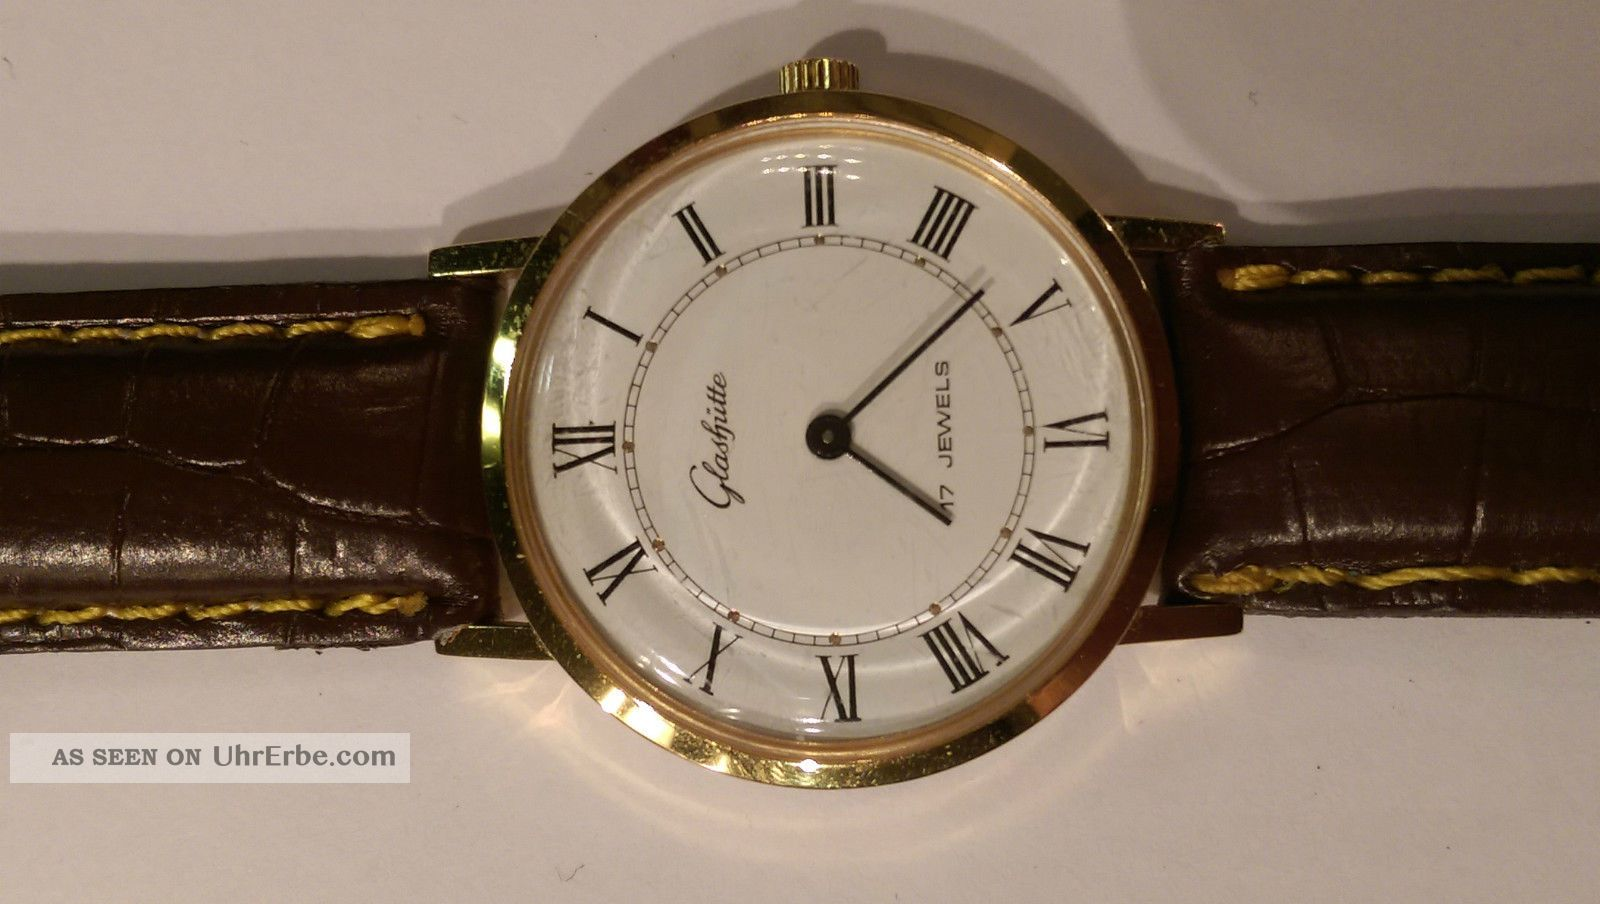 Glashütte Uhr Armbanduhren Bild